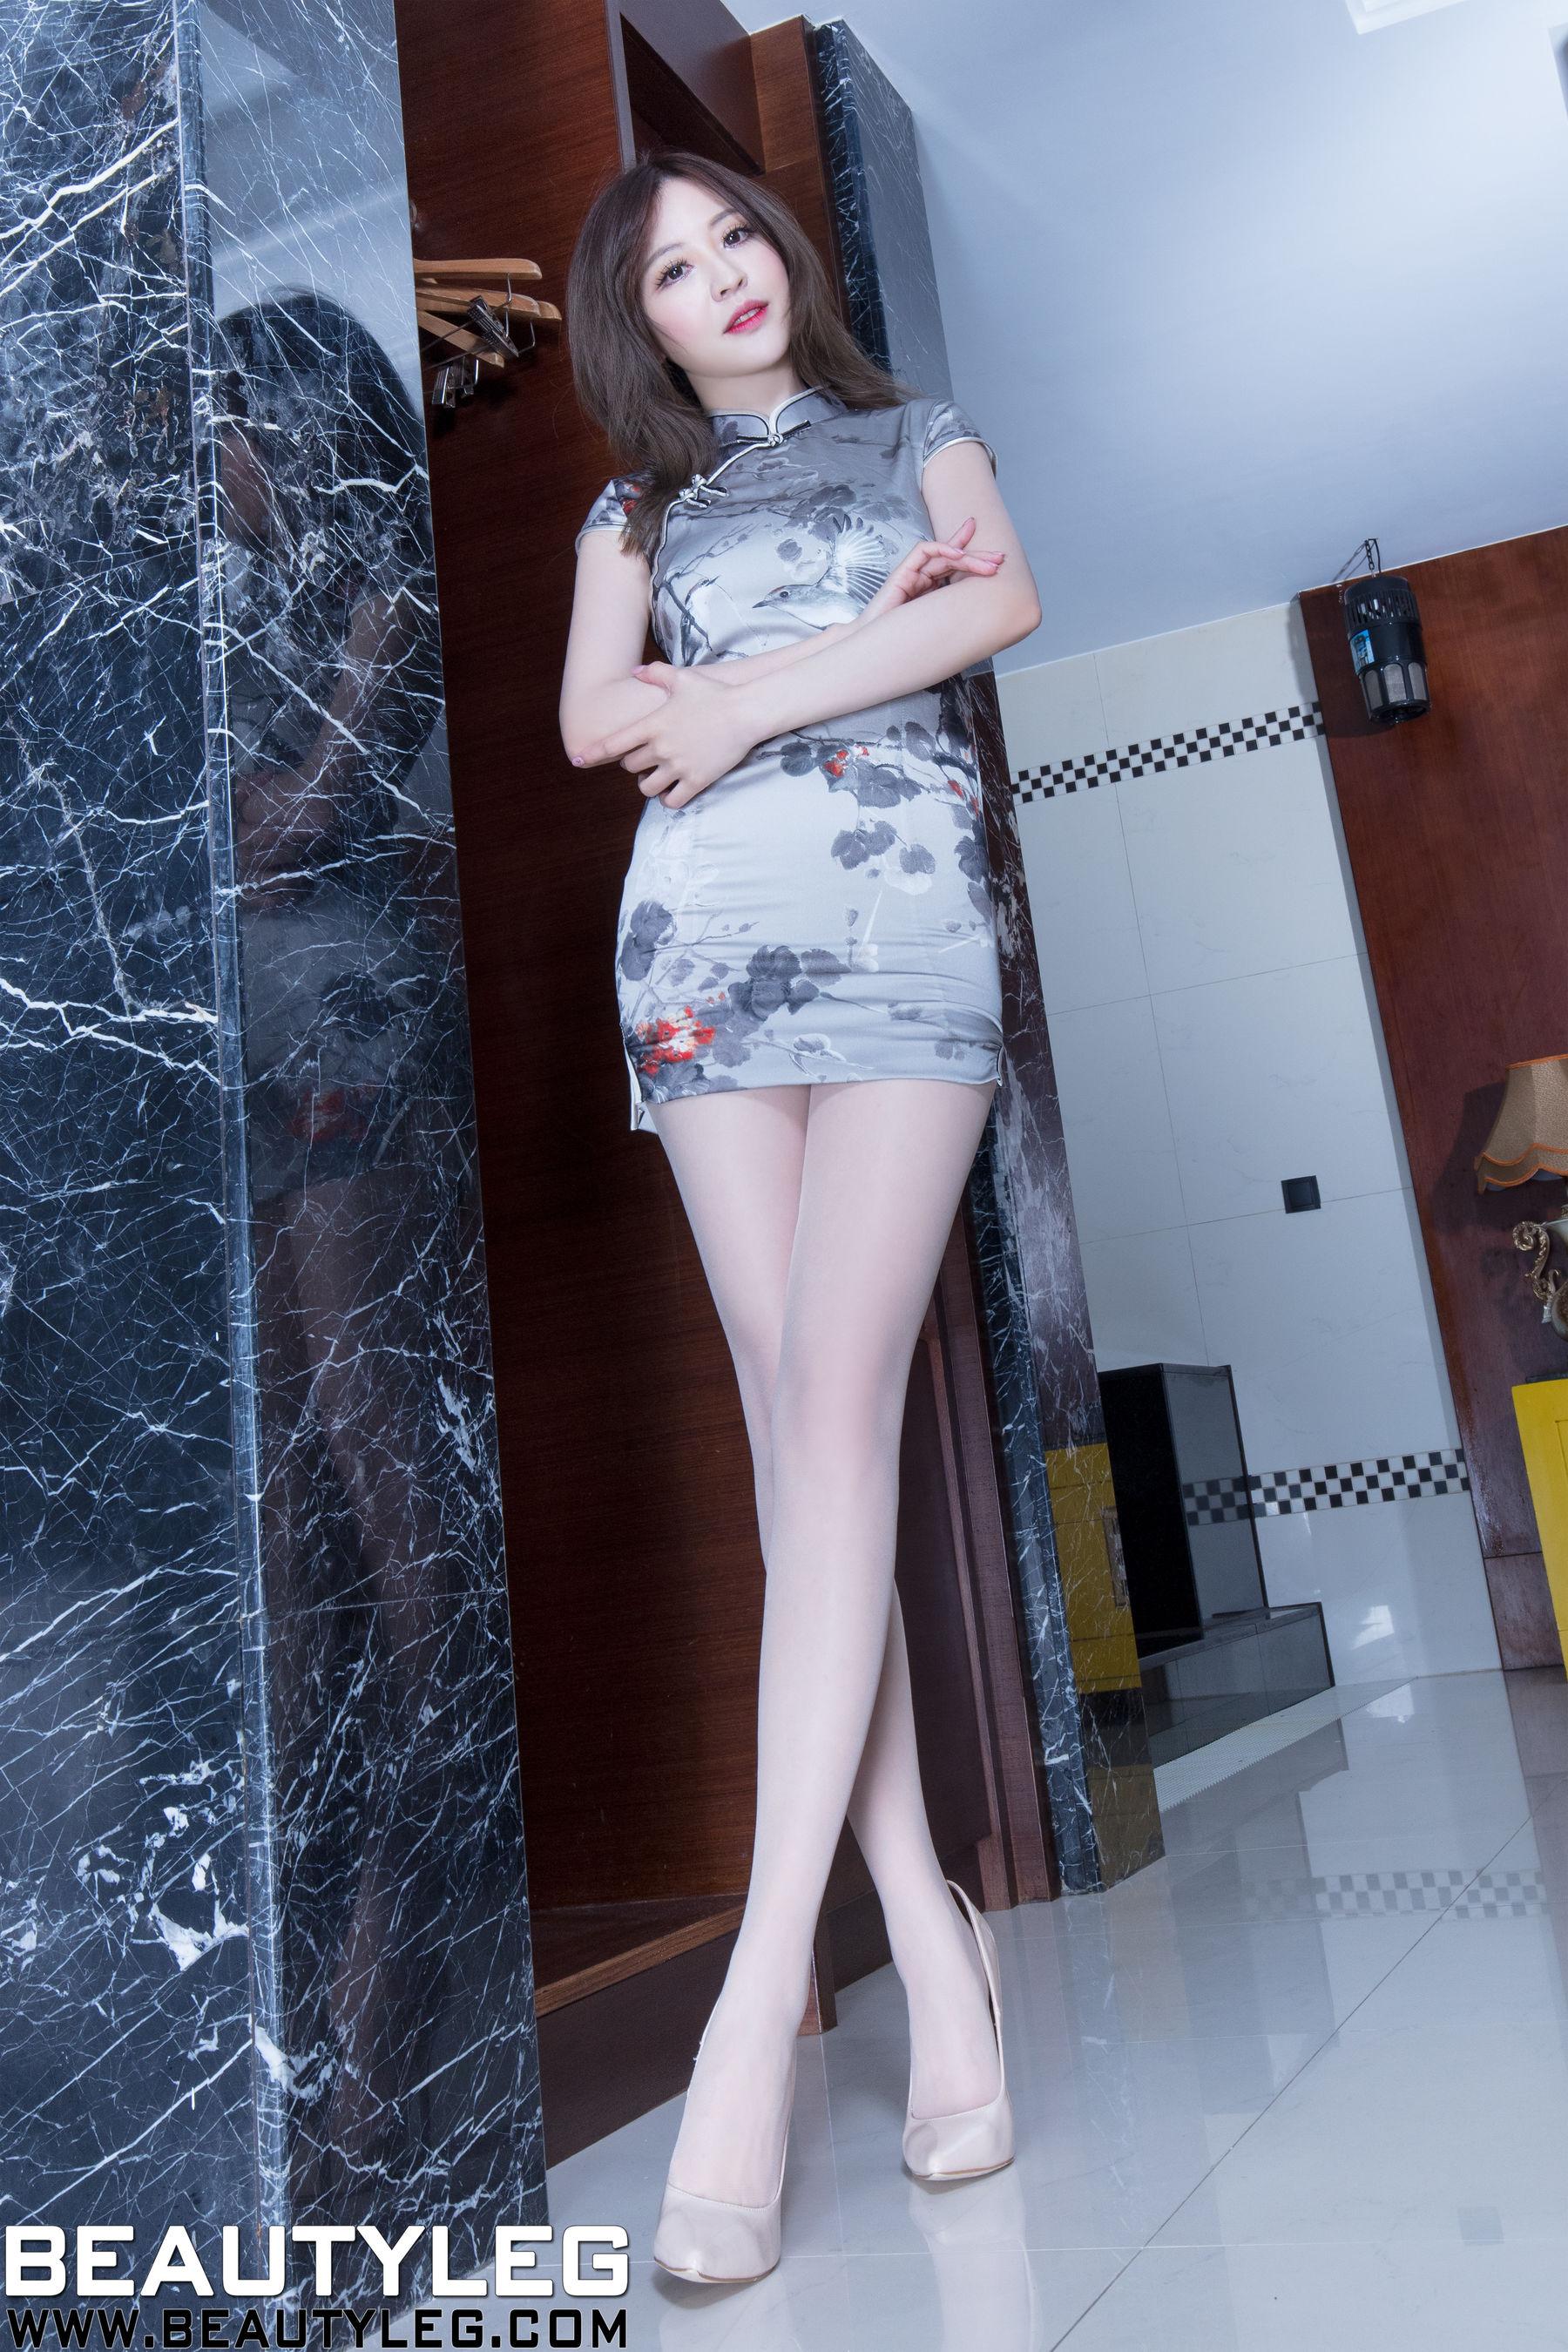 VOL.1803 [Beautyleg]旗袍丝袜美腿丝袜制服:倪千凌(腿模Lucy,陈佳筠)超高清个人性感漂亮大图(44P)